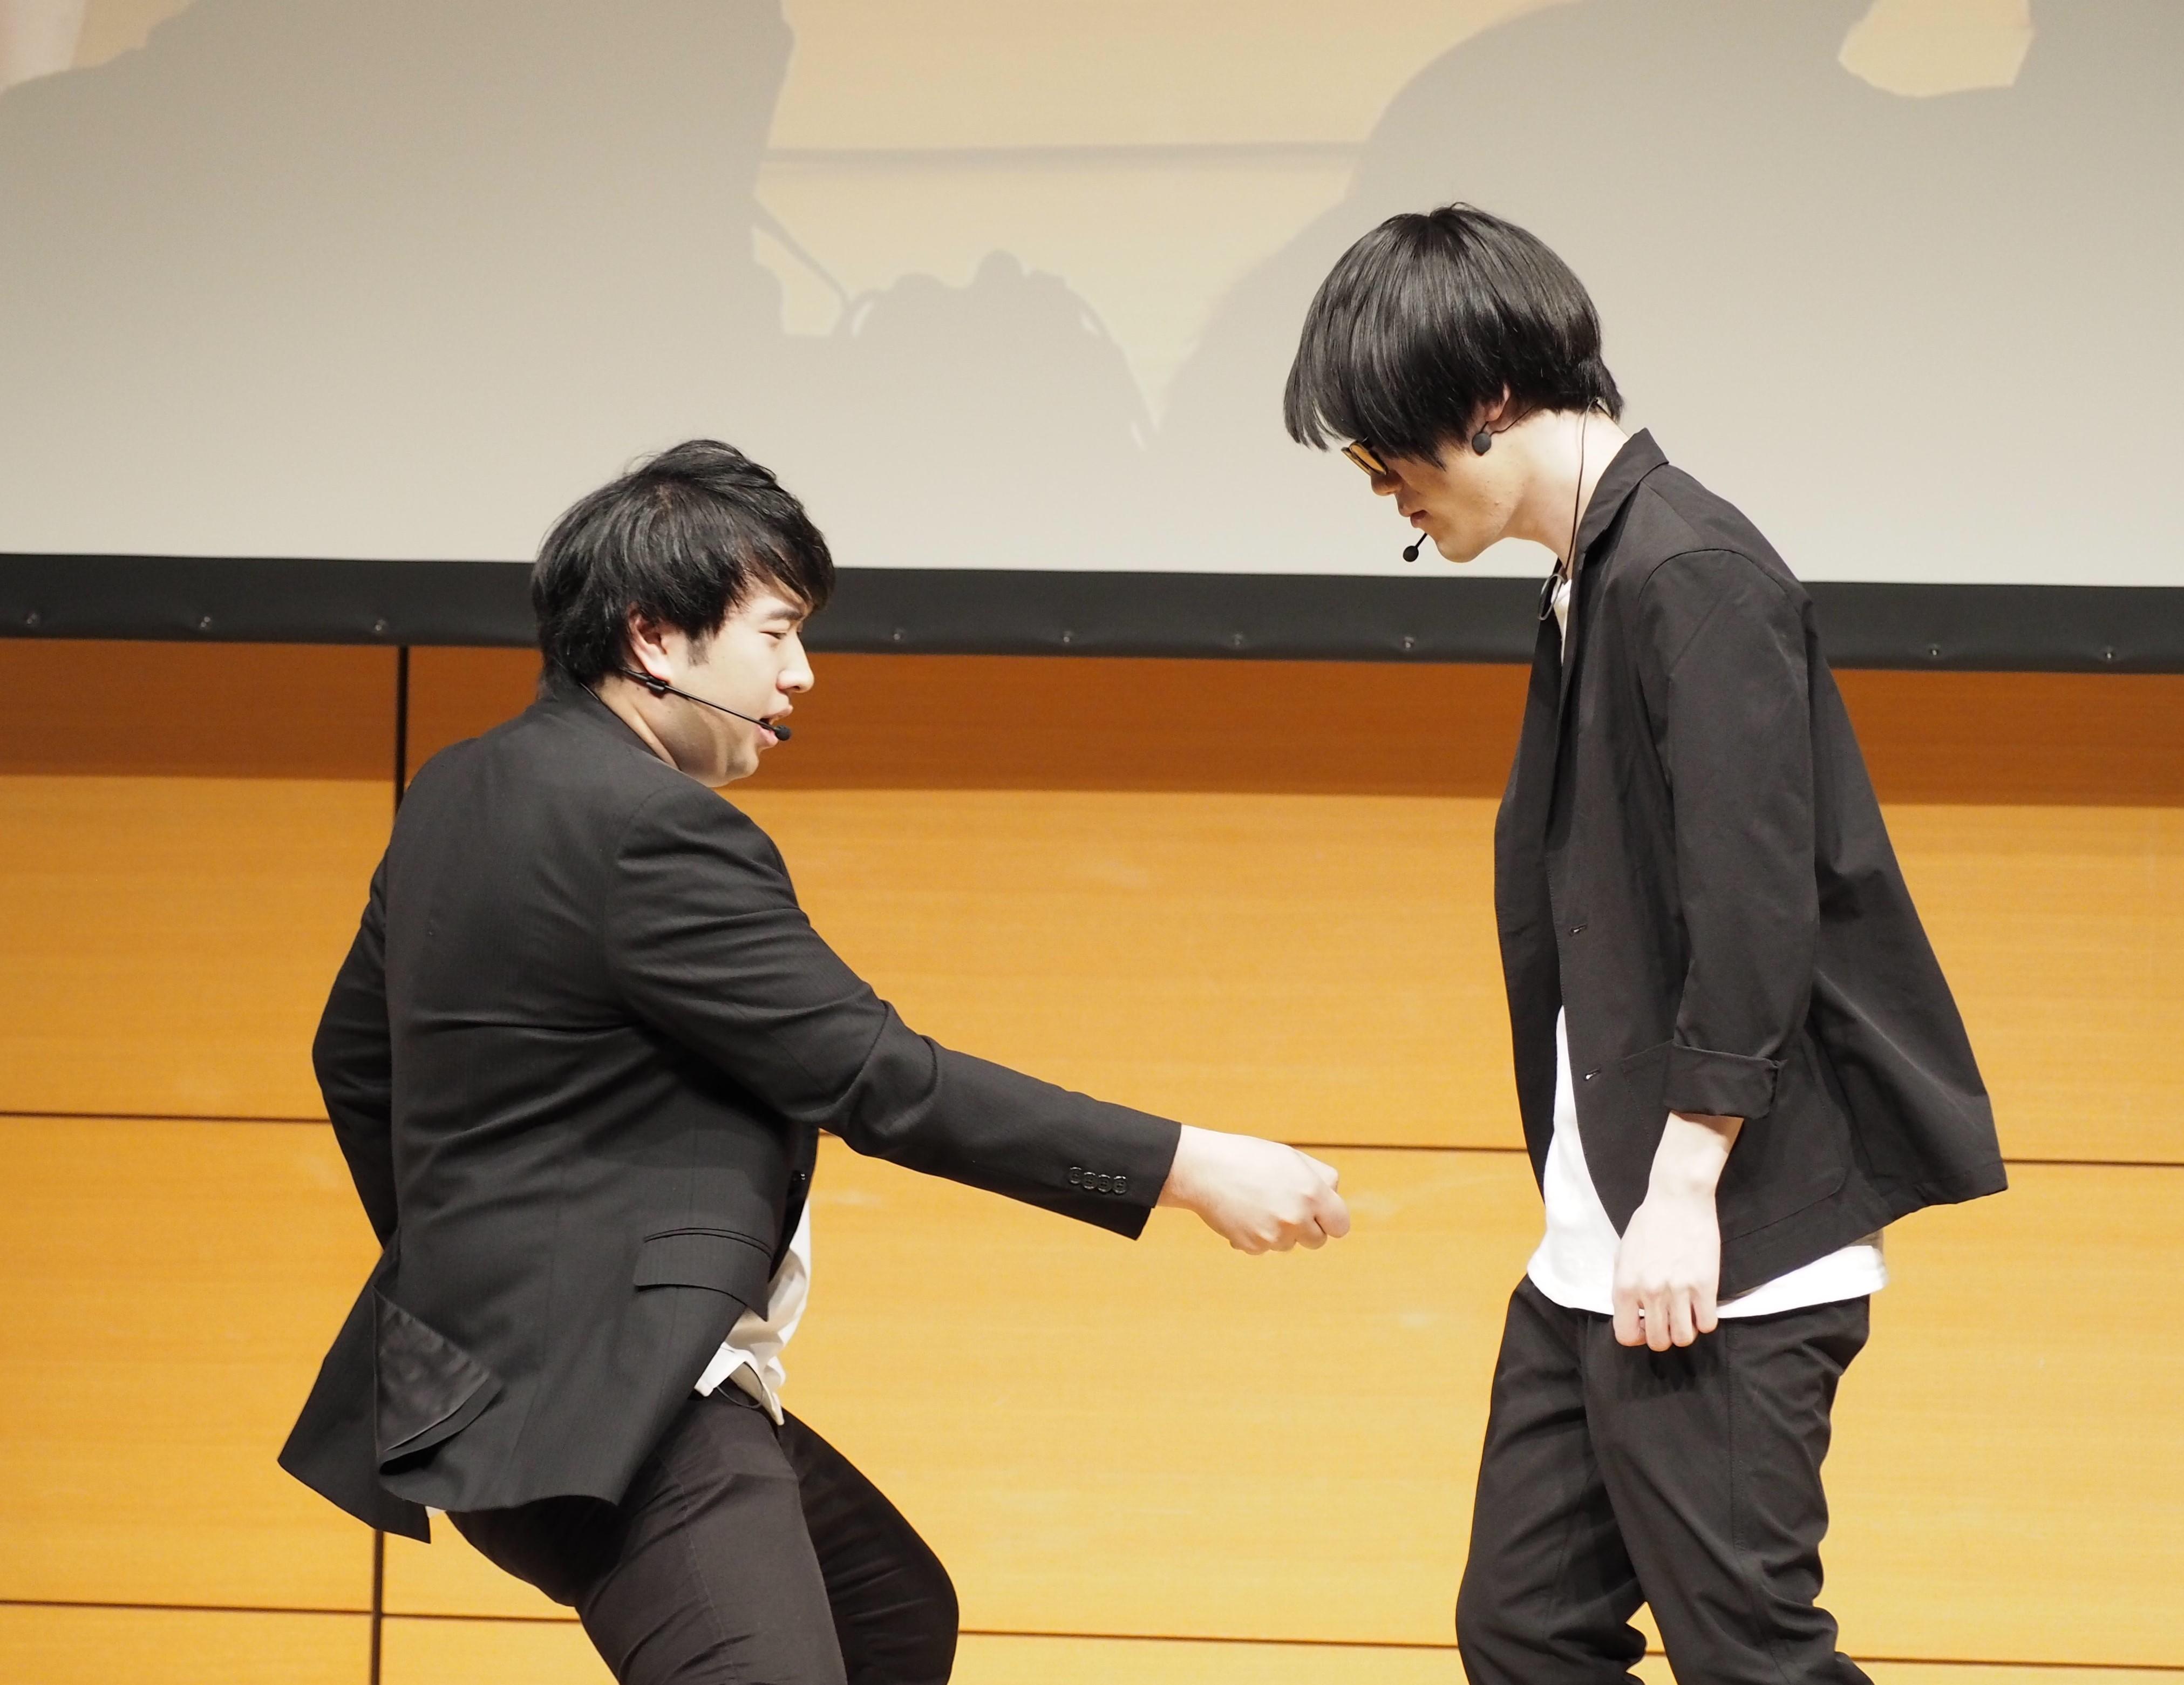 http://news.yoshimoto.co.jp/20180131220110-7880d93a949445e291472f81679f65916f675a6c.jpg